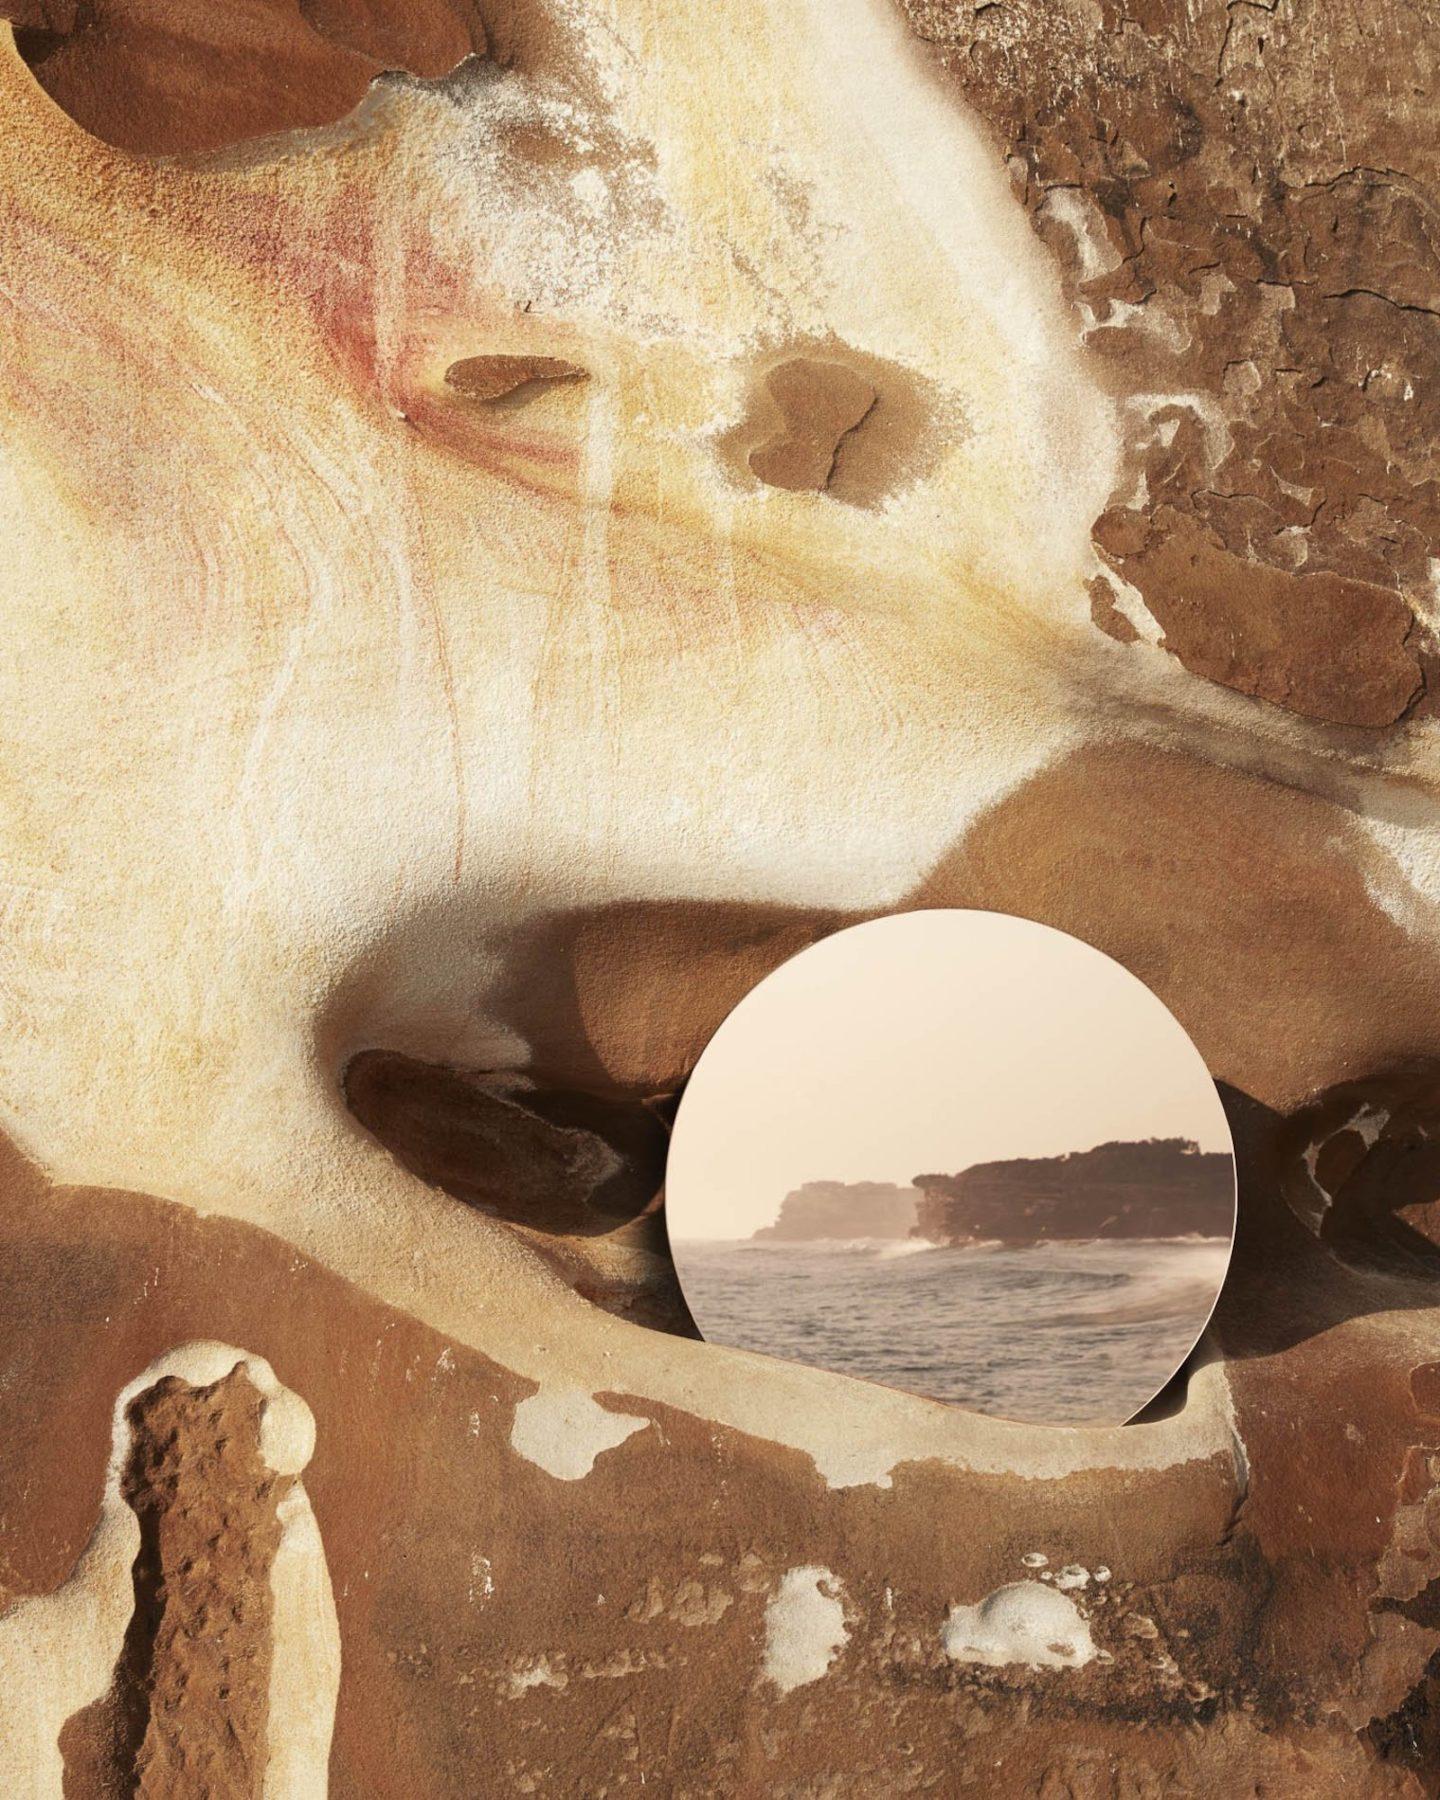 ignant-design-sarah-ellison-the-new-wave-008-1440x1800